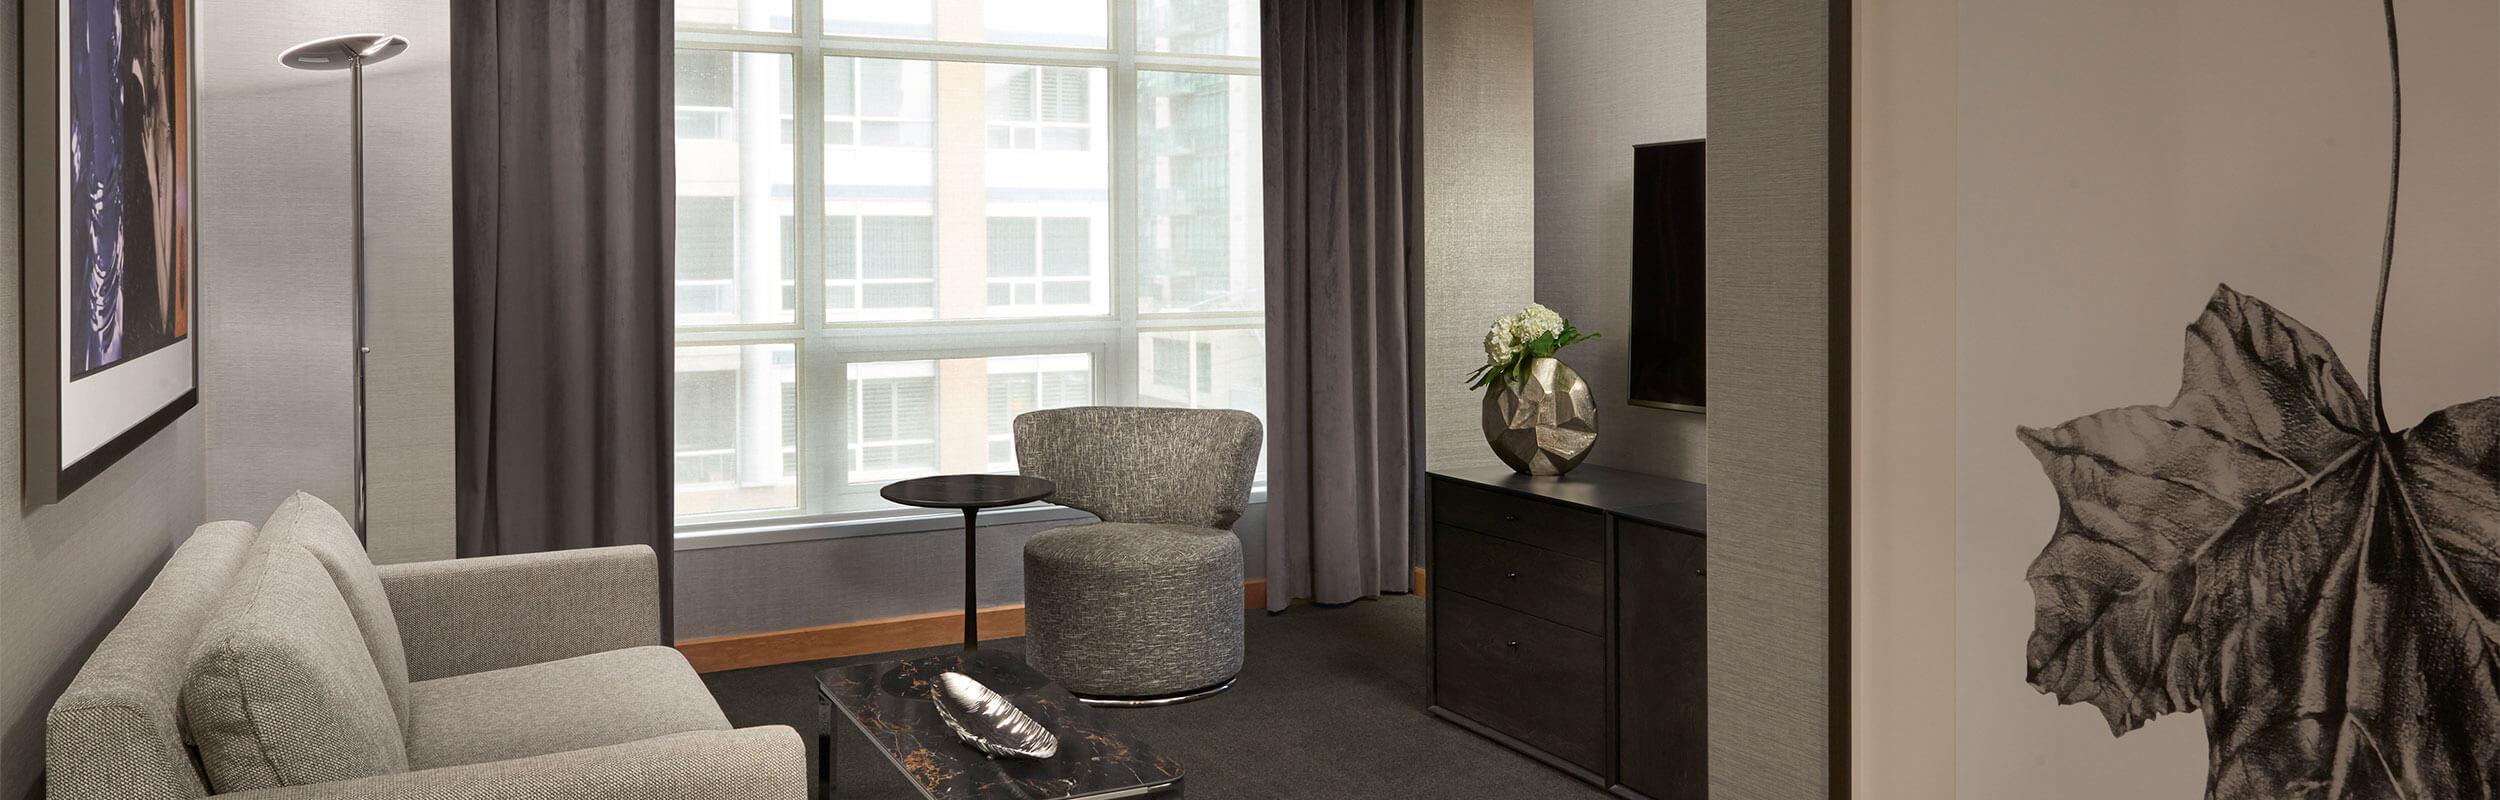 SoHo Hotel renovated corner executive suite